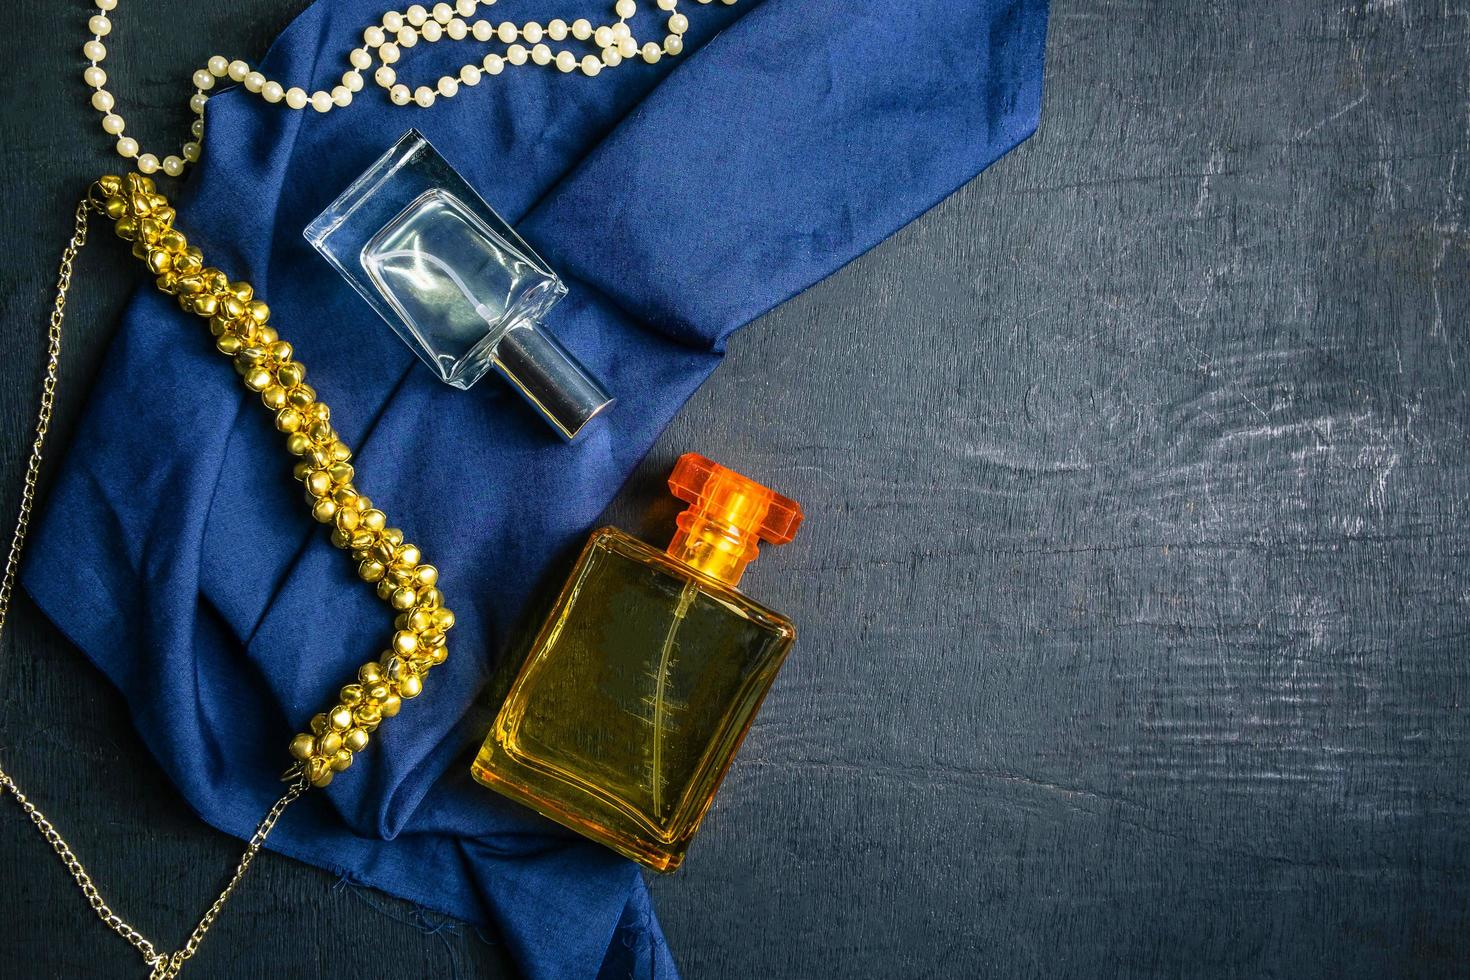 Perfume and jewelry photo